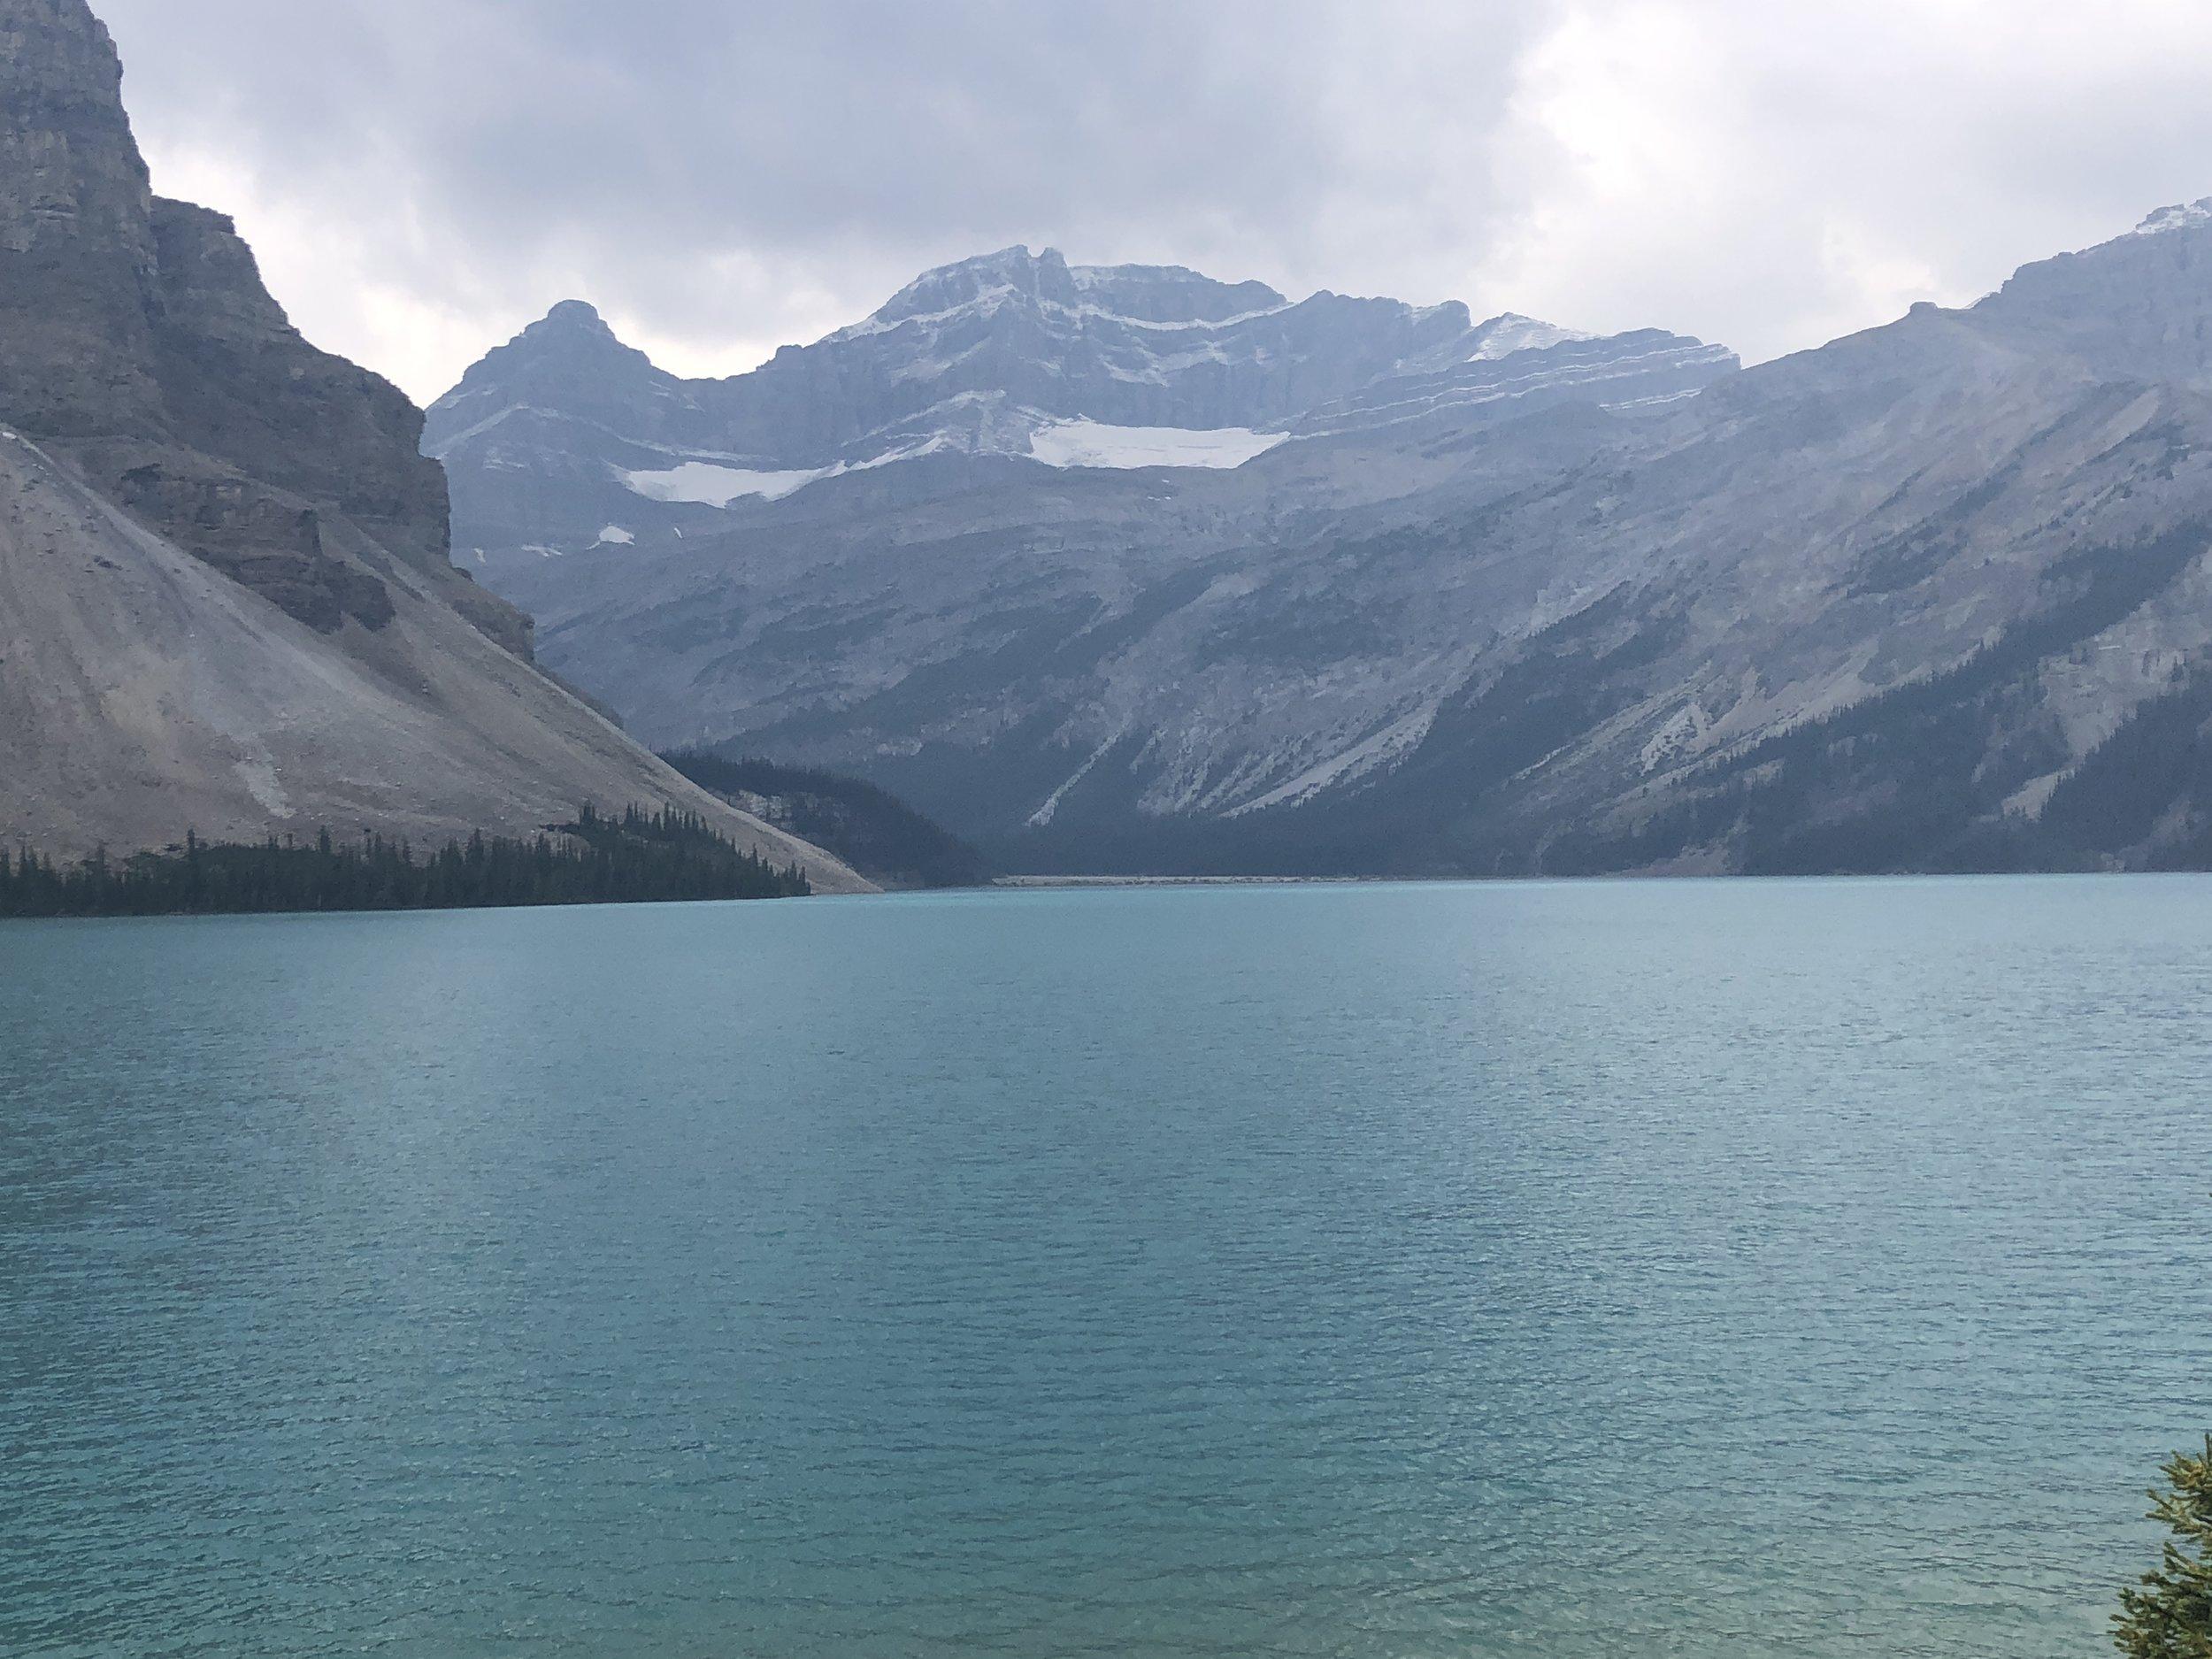 Random no-name gorgeous lake!